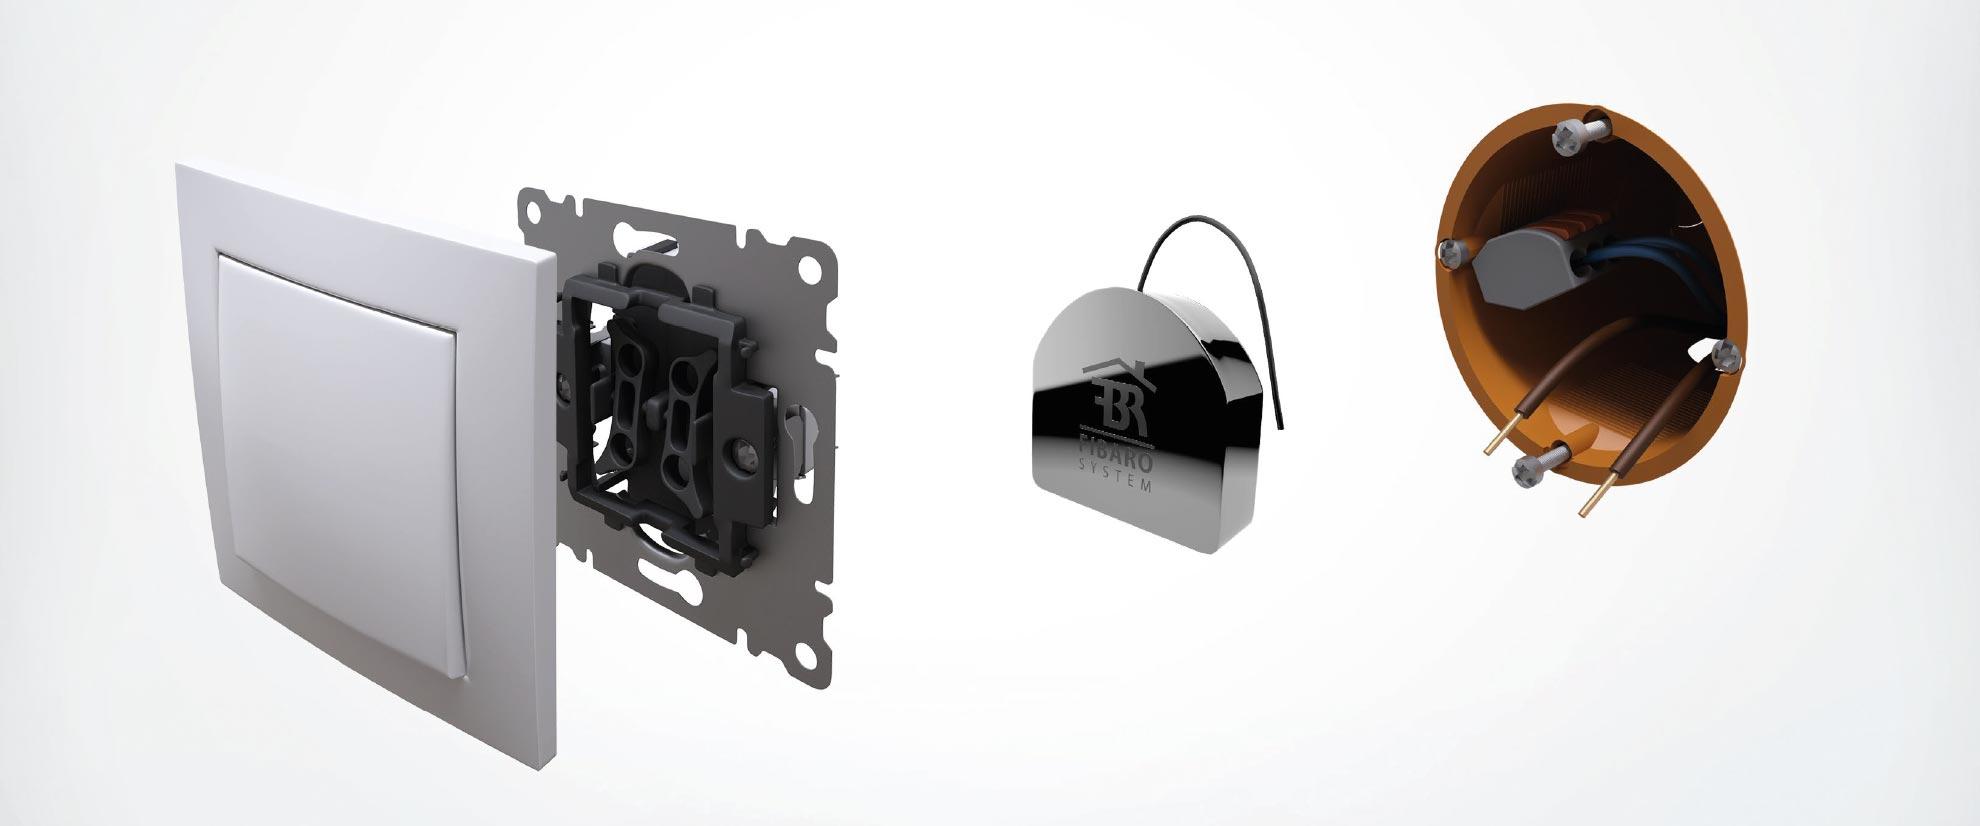 Fibaro-Single-Switch-2-stebilex-smart-home